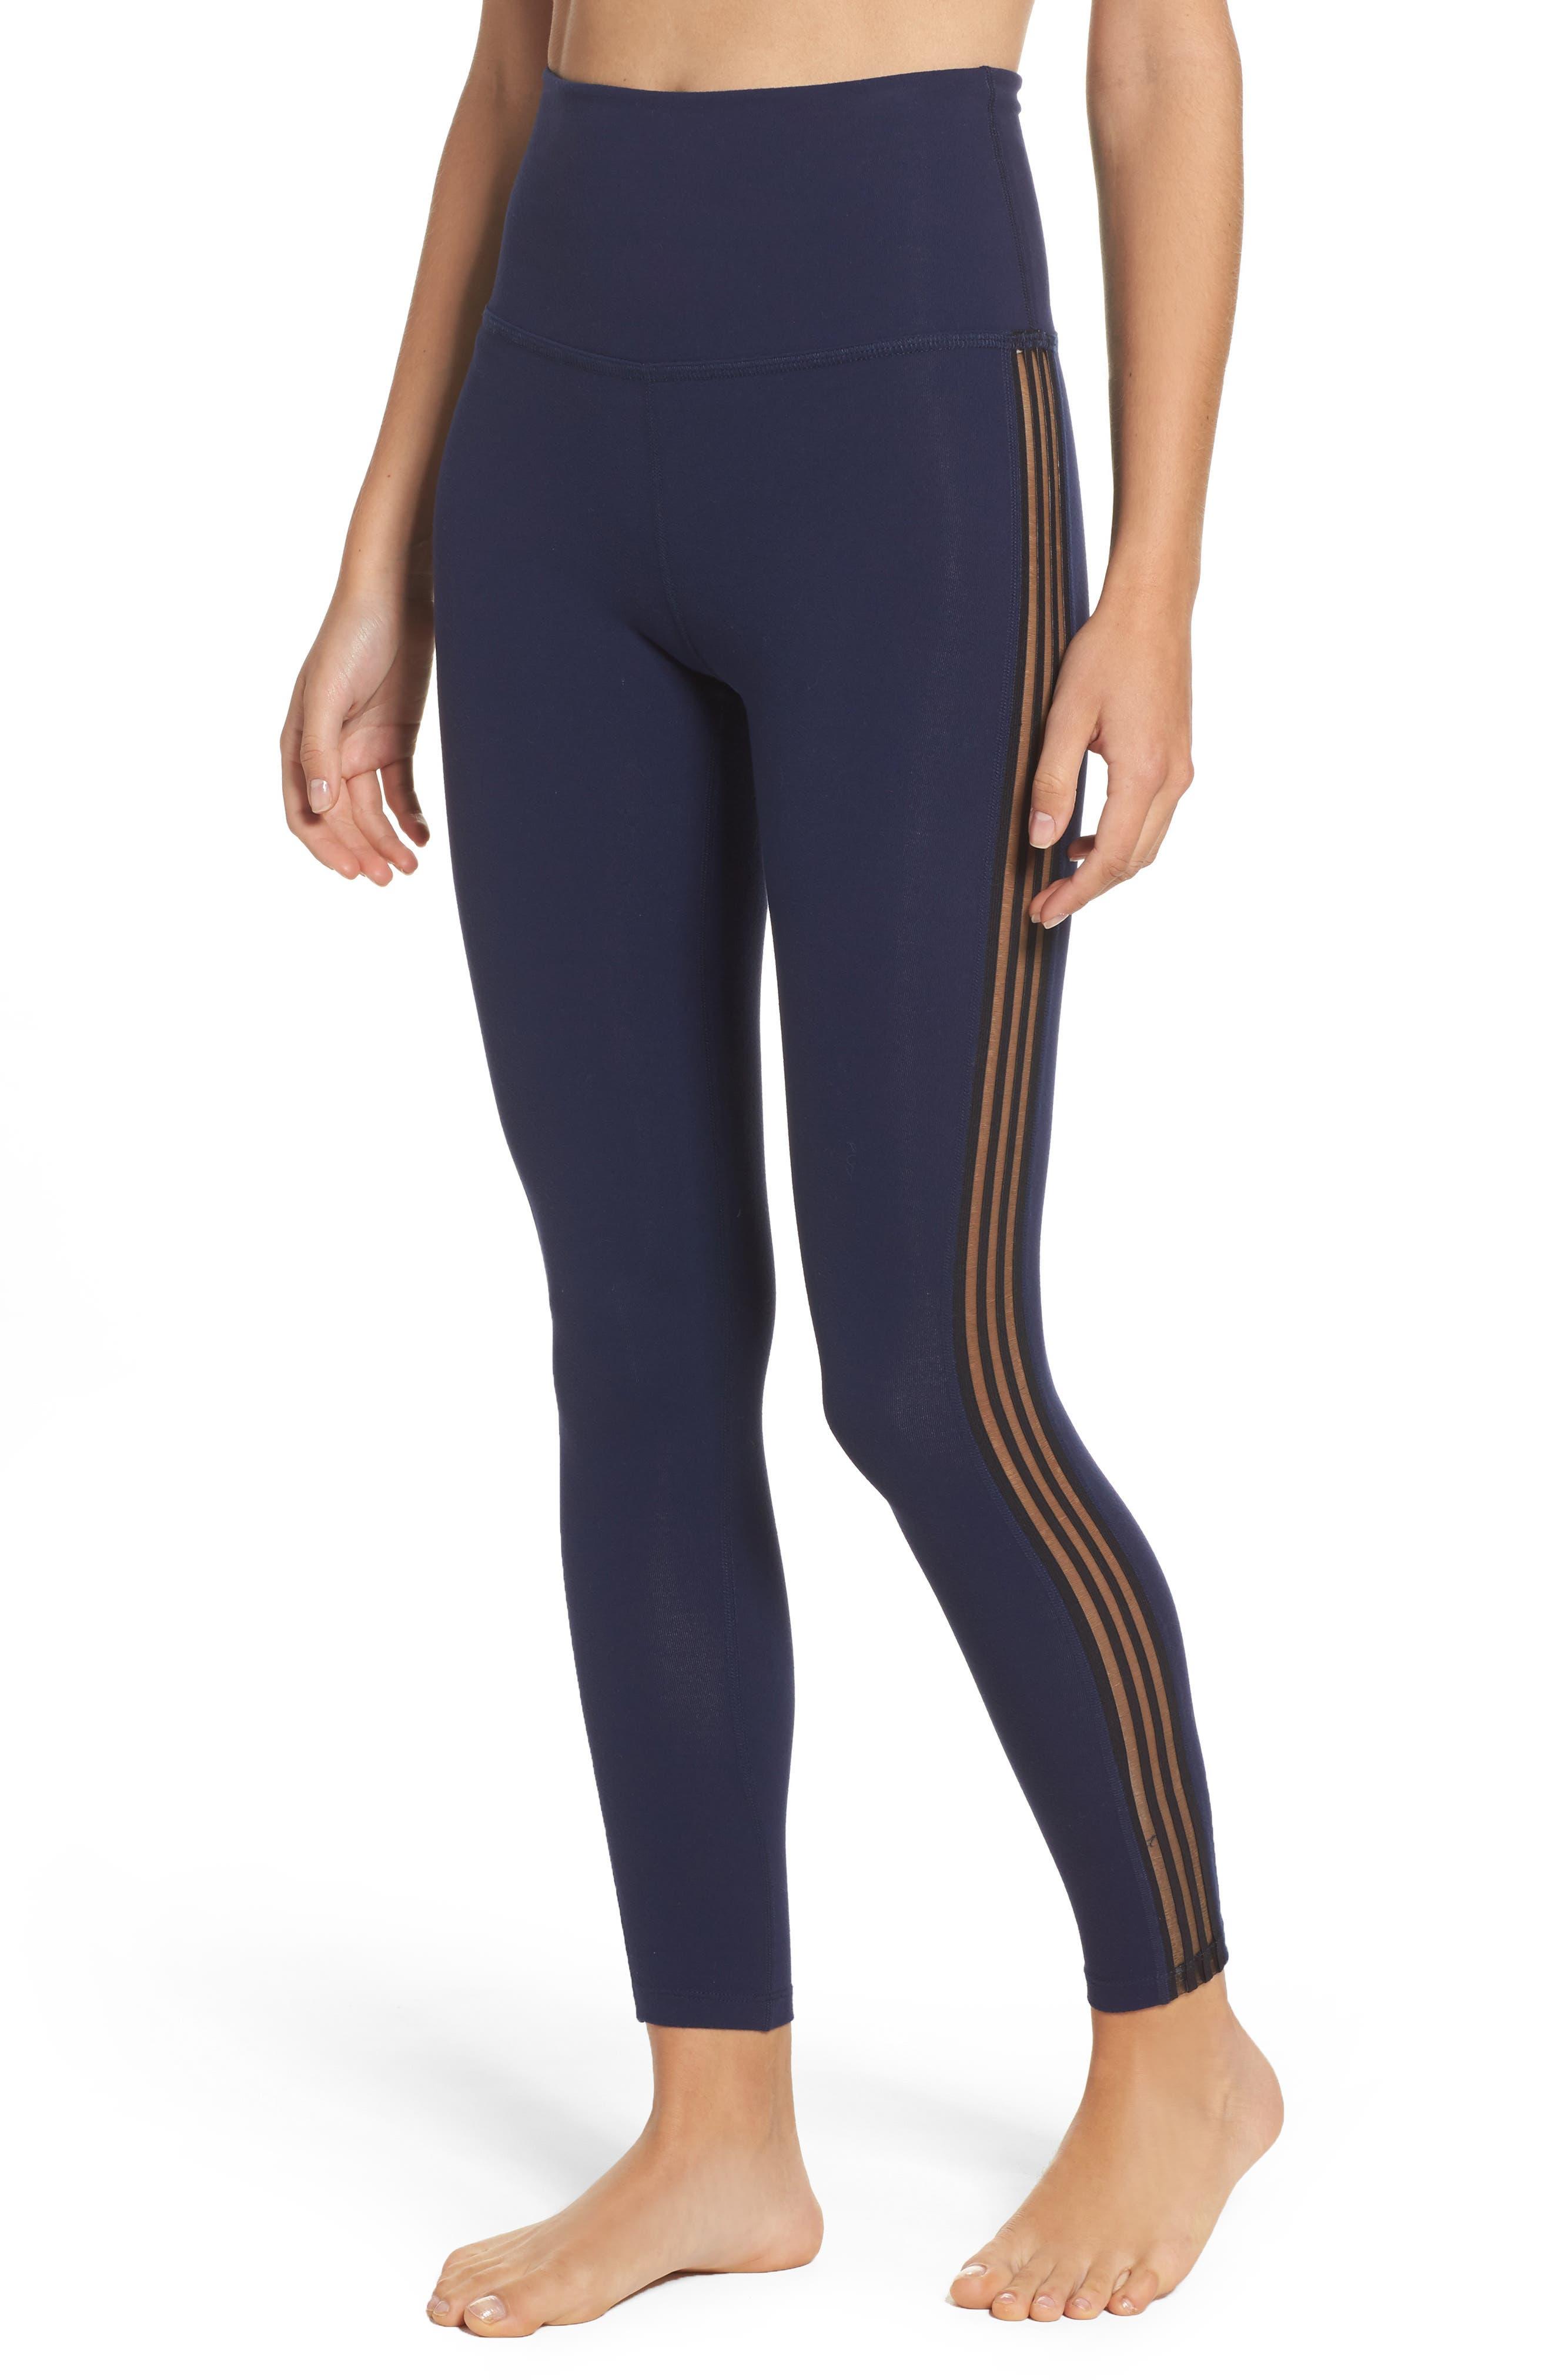 Sheer Illusion High Waist Leggings,                         Main,                         color, Valor Navy